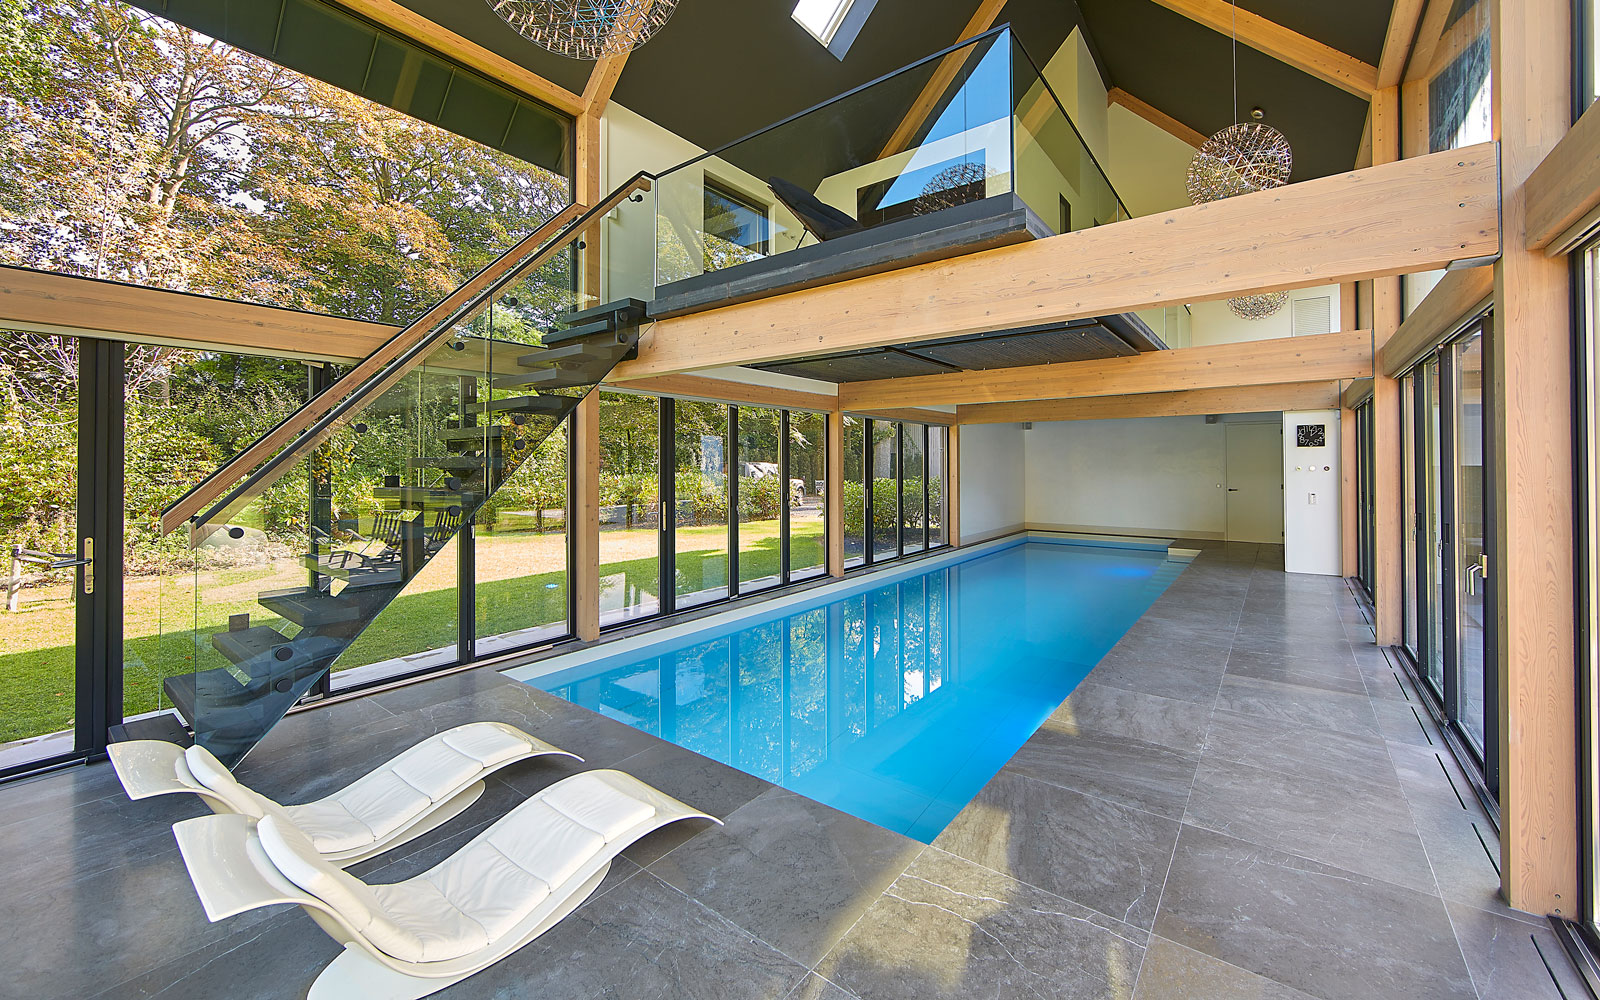 Zwembad, Waterstijl, verwarmd, wellness, relaxruimte, vide, symmetrische villa, PBV Architects